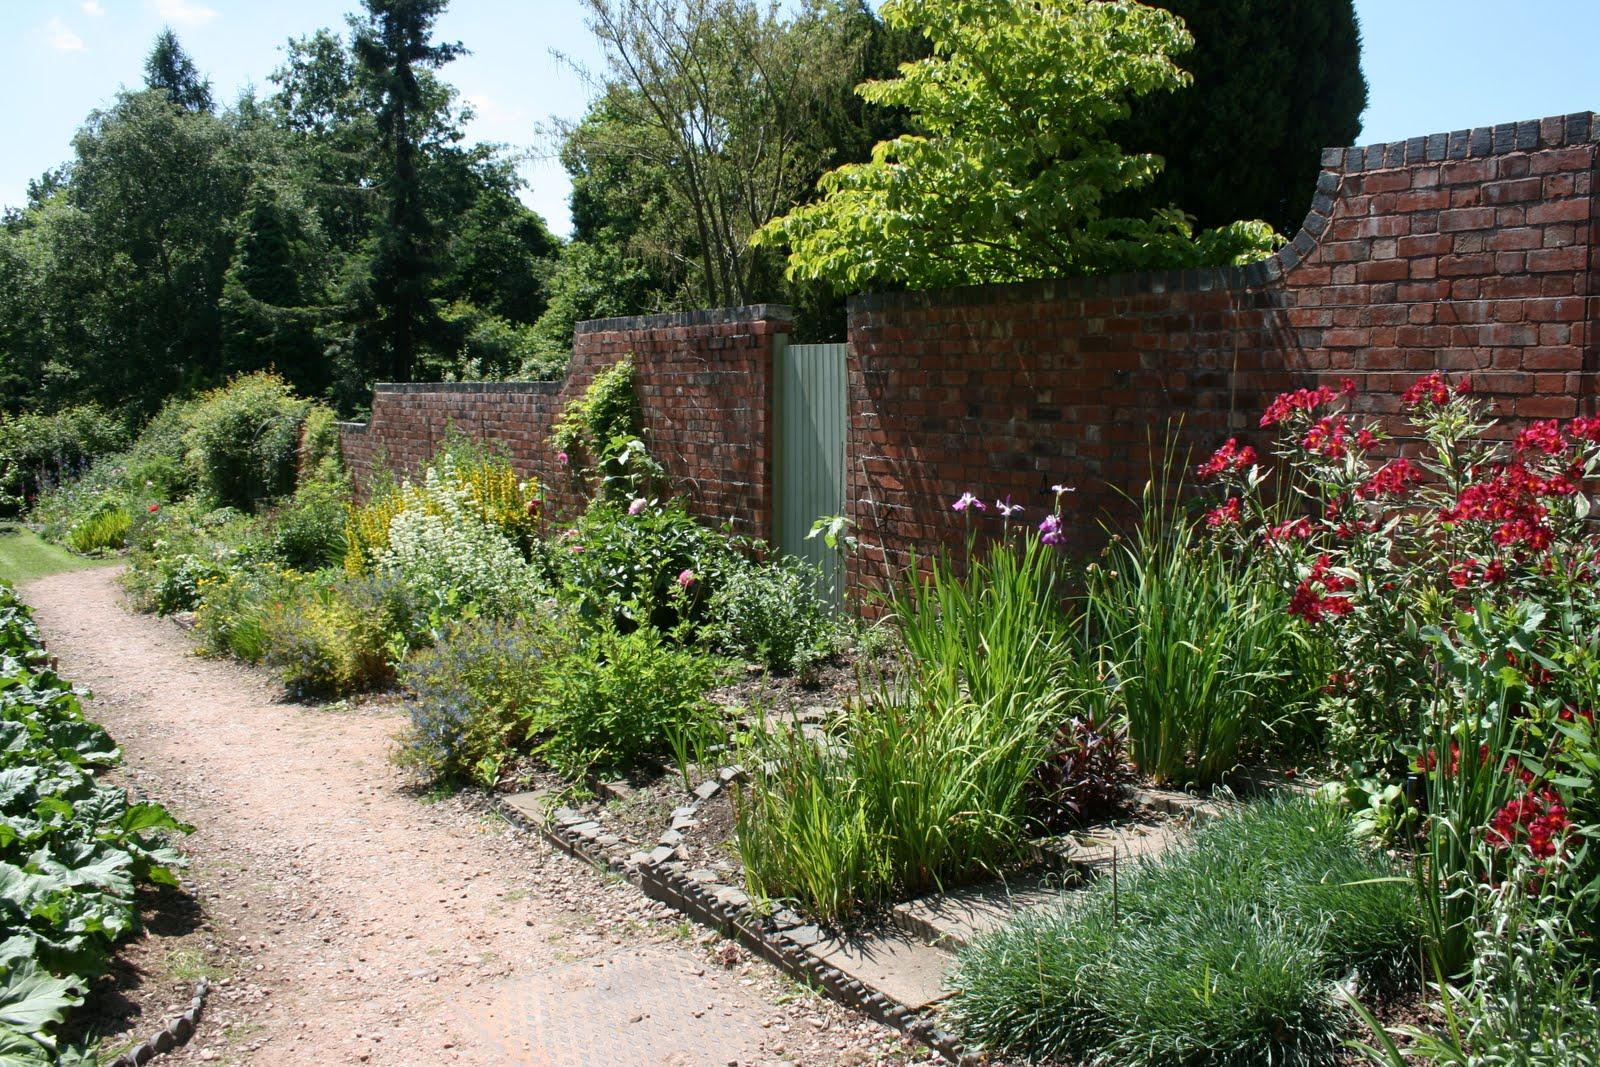 Woodbrooke Good Lives Blog: Woodbrooke gardens and grounds ...